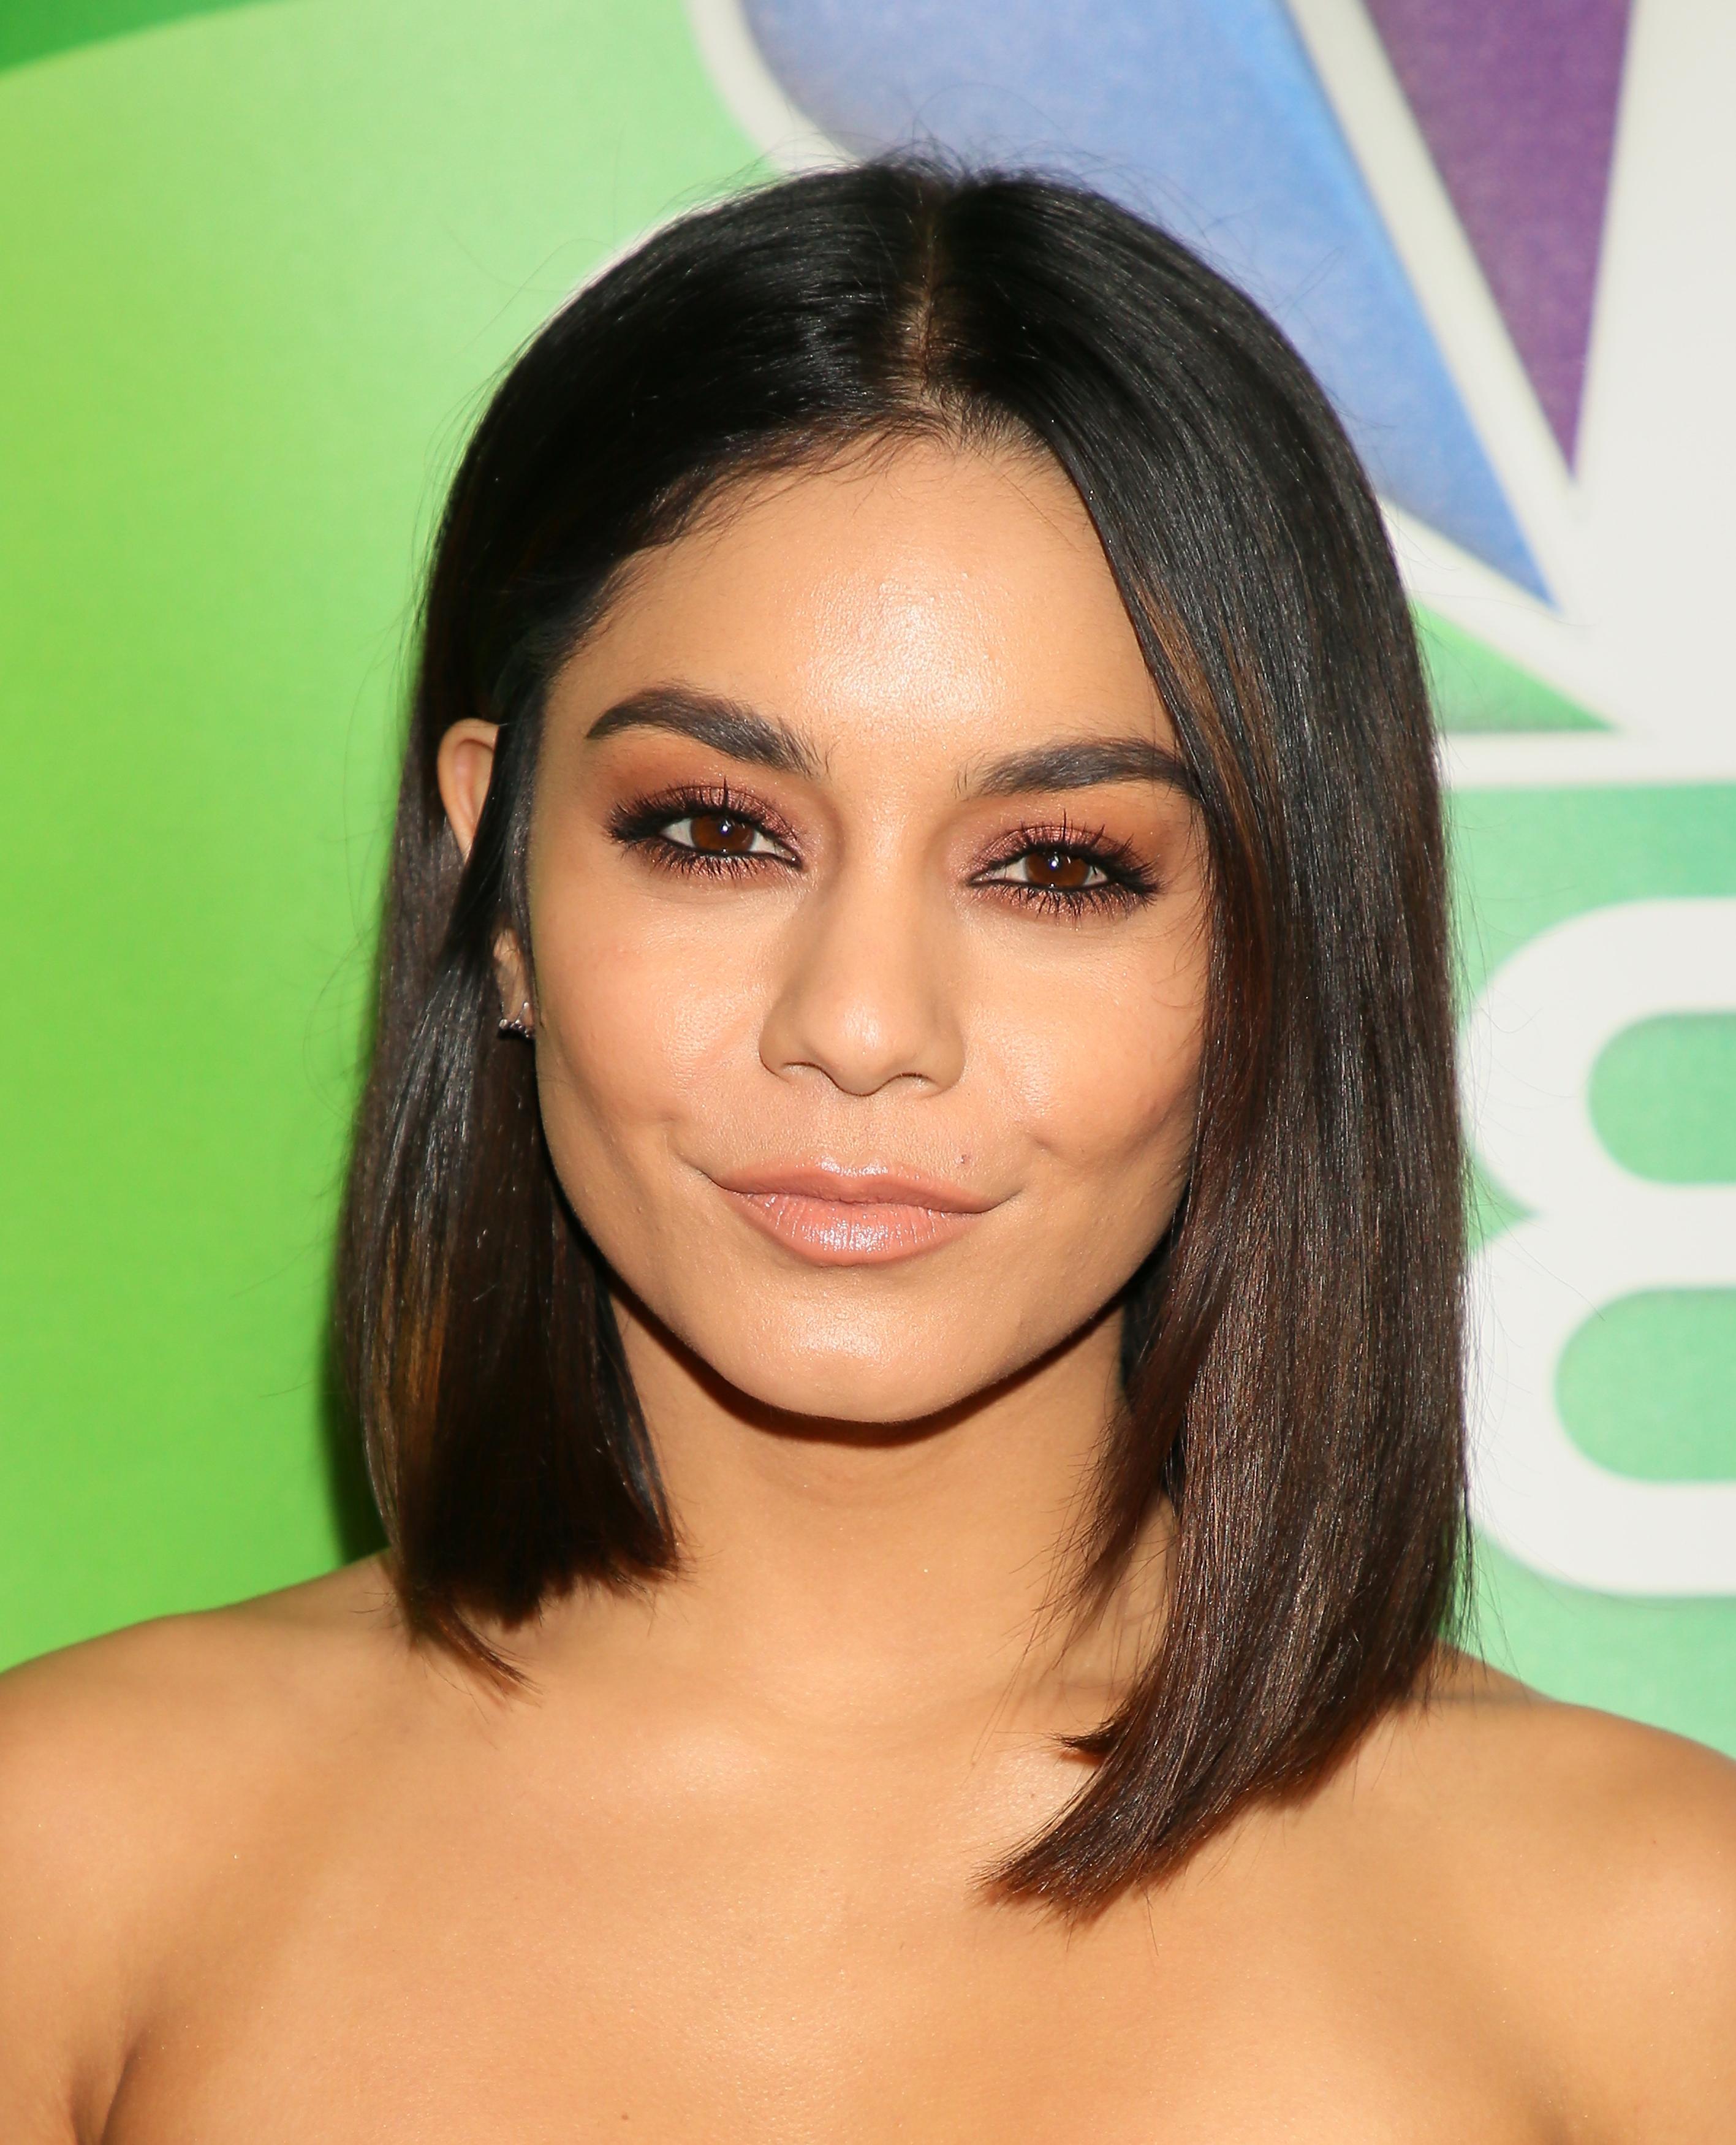 Vanessa Hudgens Short Hair | Galhairs Within Vanessa Hudgens Short Hairstyles (View 4 of 25)